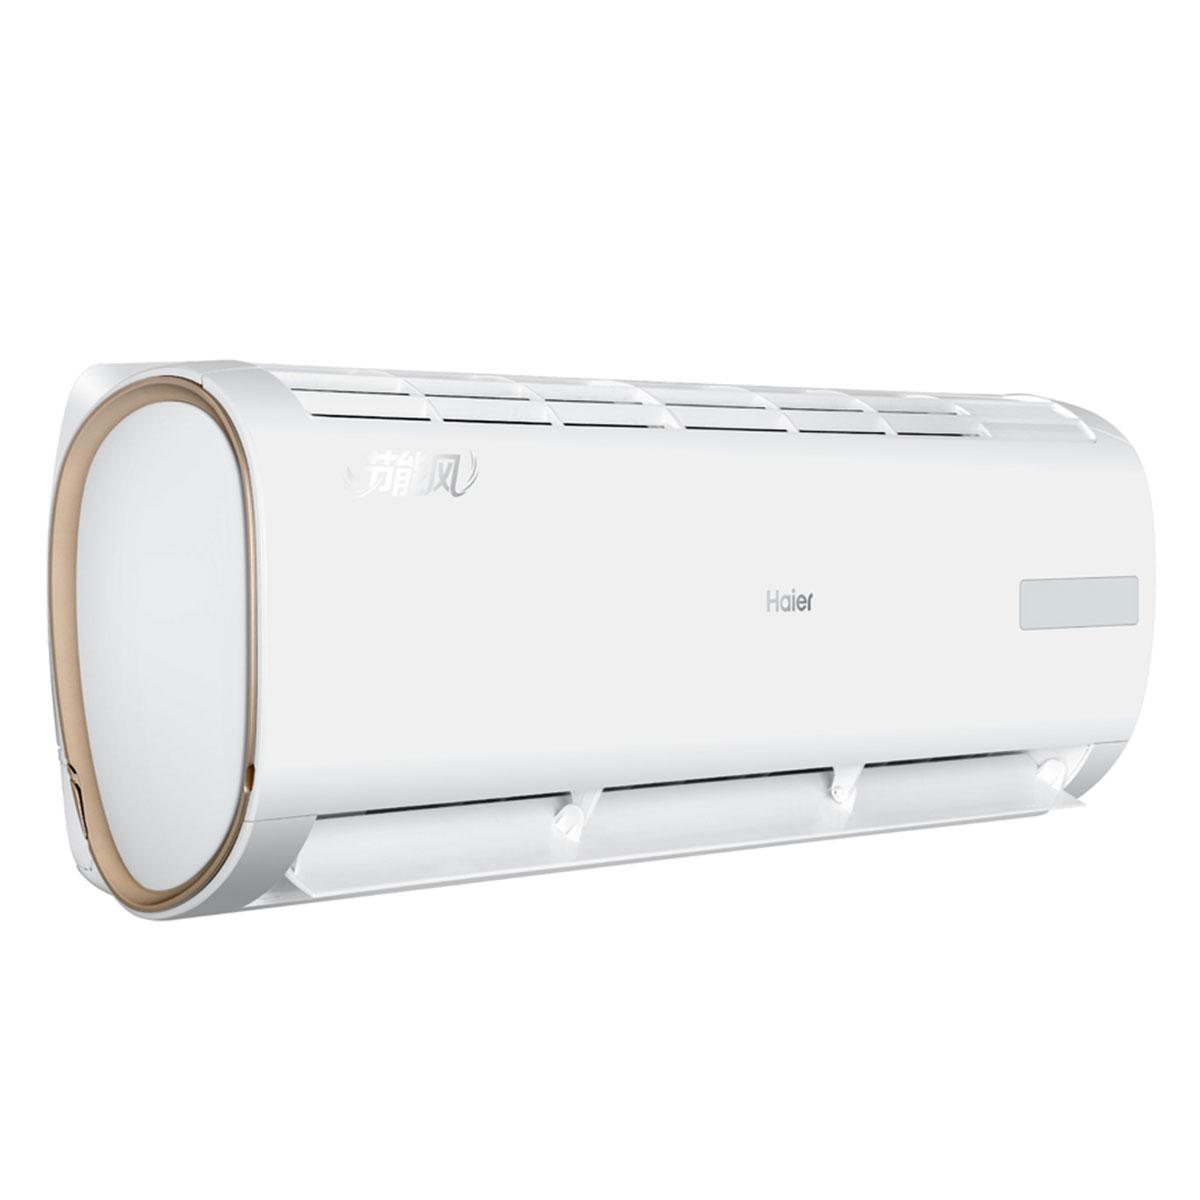 Haier/海尔                         高效定频壁挂式空调                         KFR-23GW/13BEA13套机